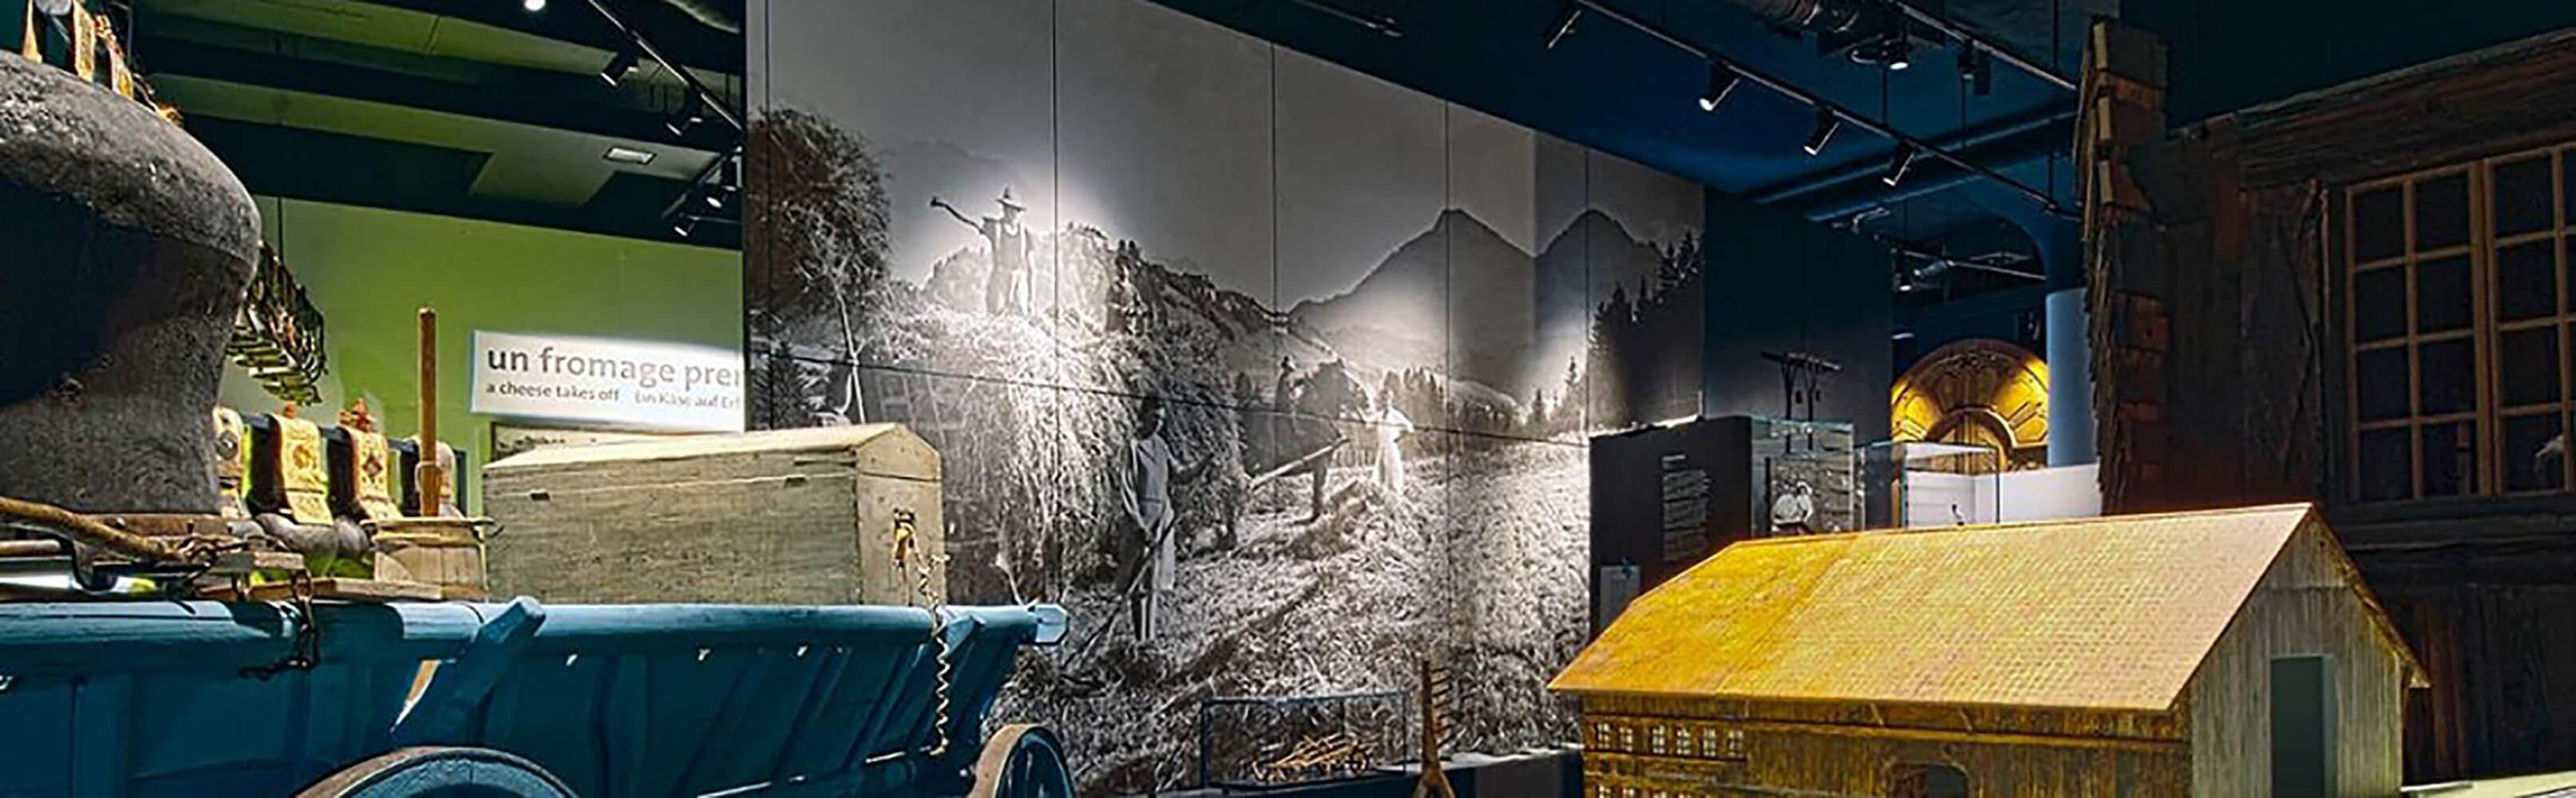 Musée gruérien Bulle 1